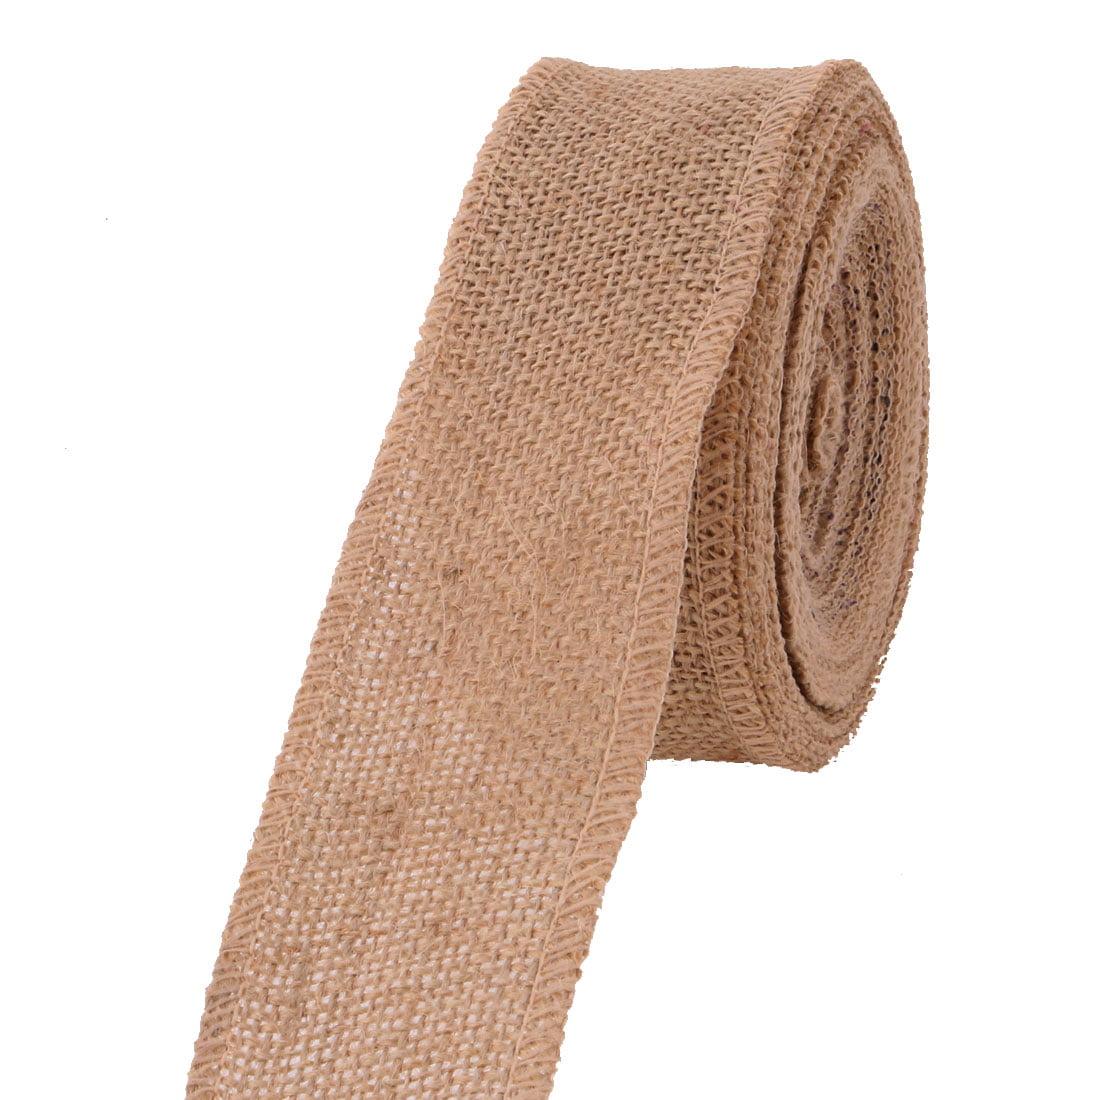 Christmas Day Burlap Gift Wrapping DIY Handcraft Ribbon Roll 11 Yards